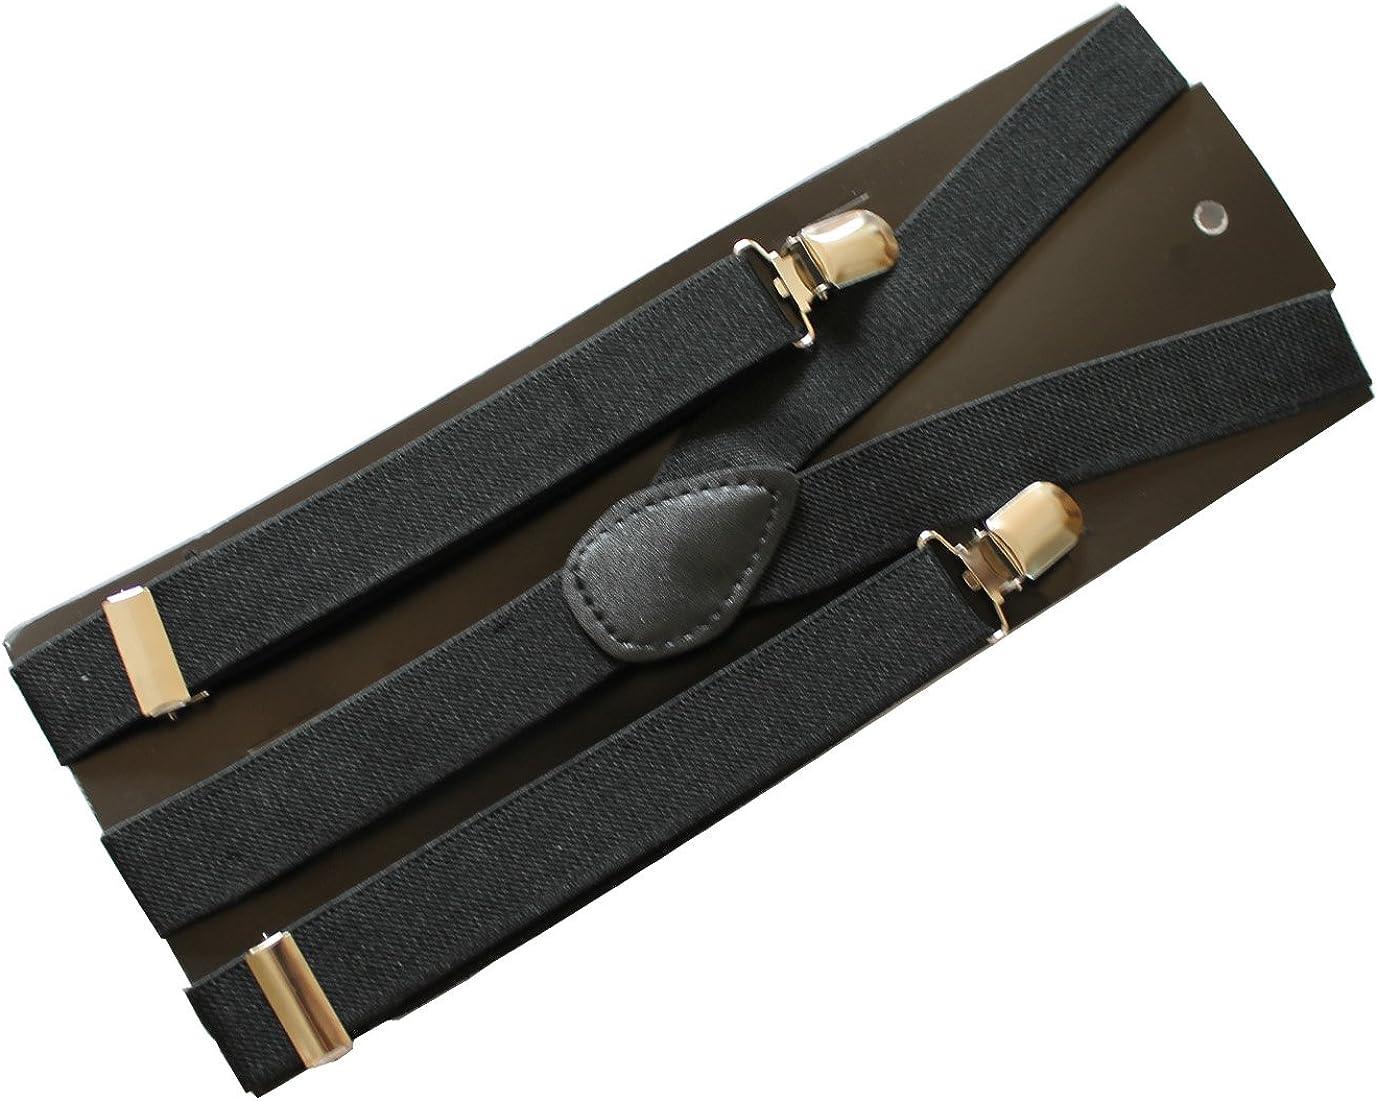 New Suspender 2.5cm Unisex Clip-on Braces Elastic Y-back